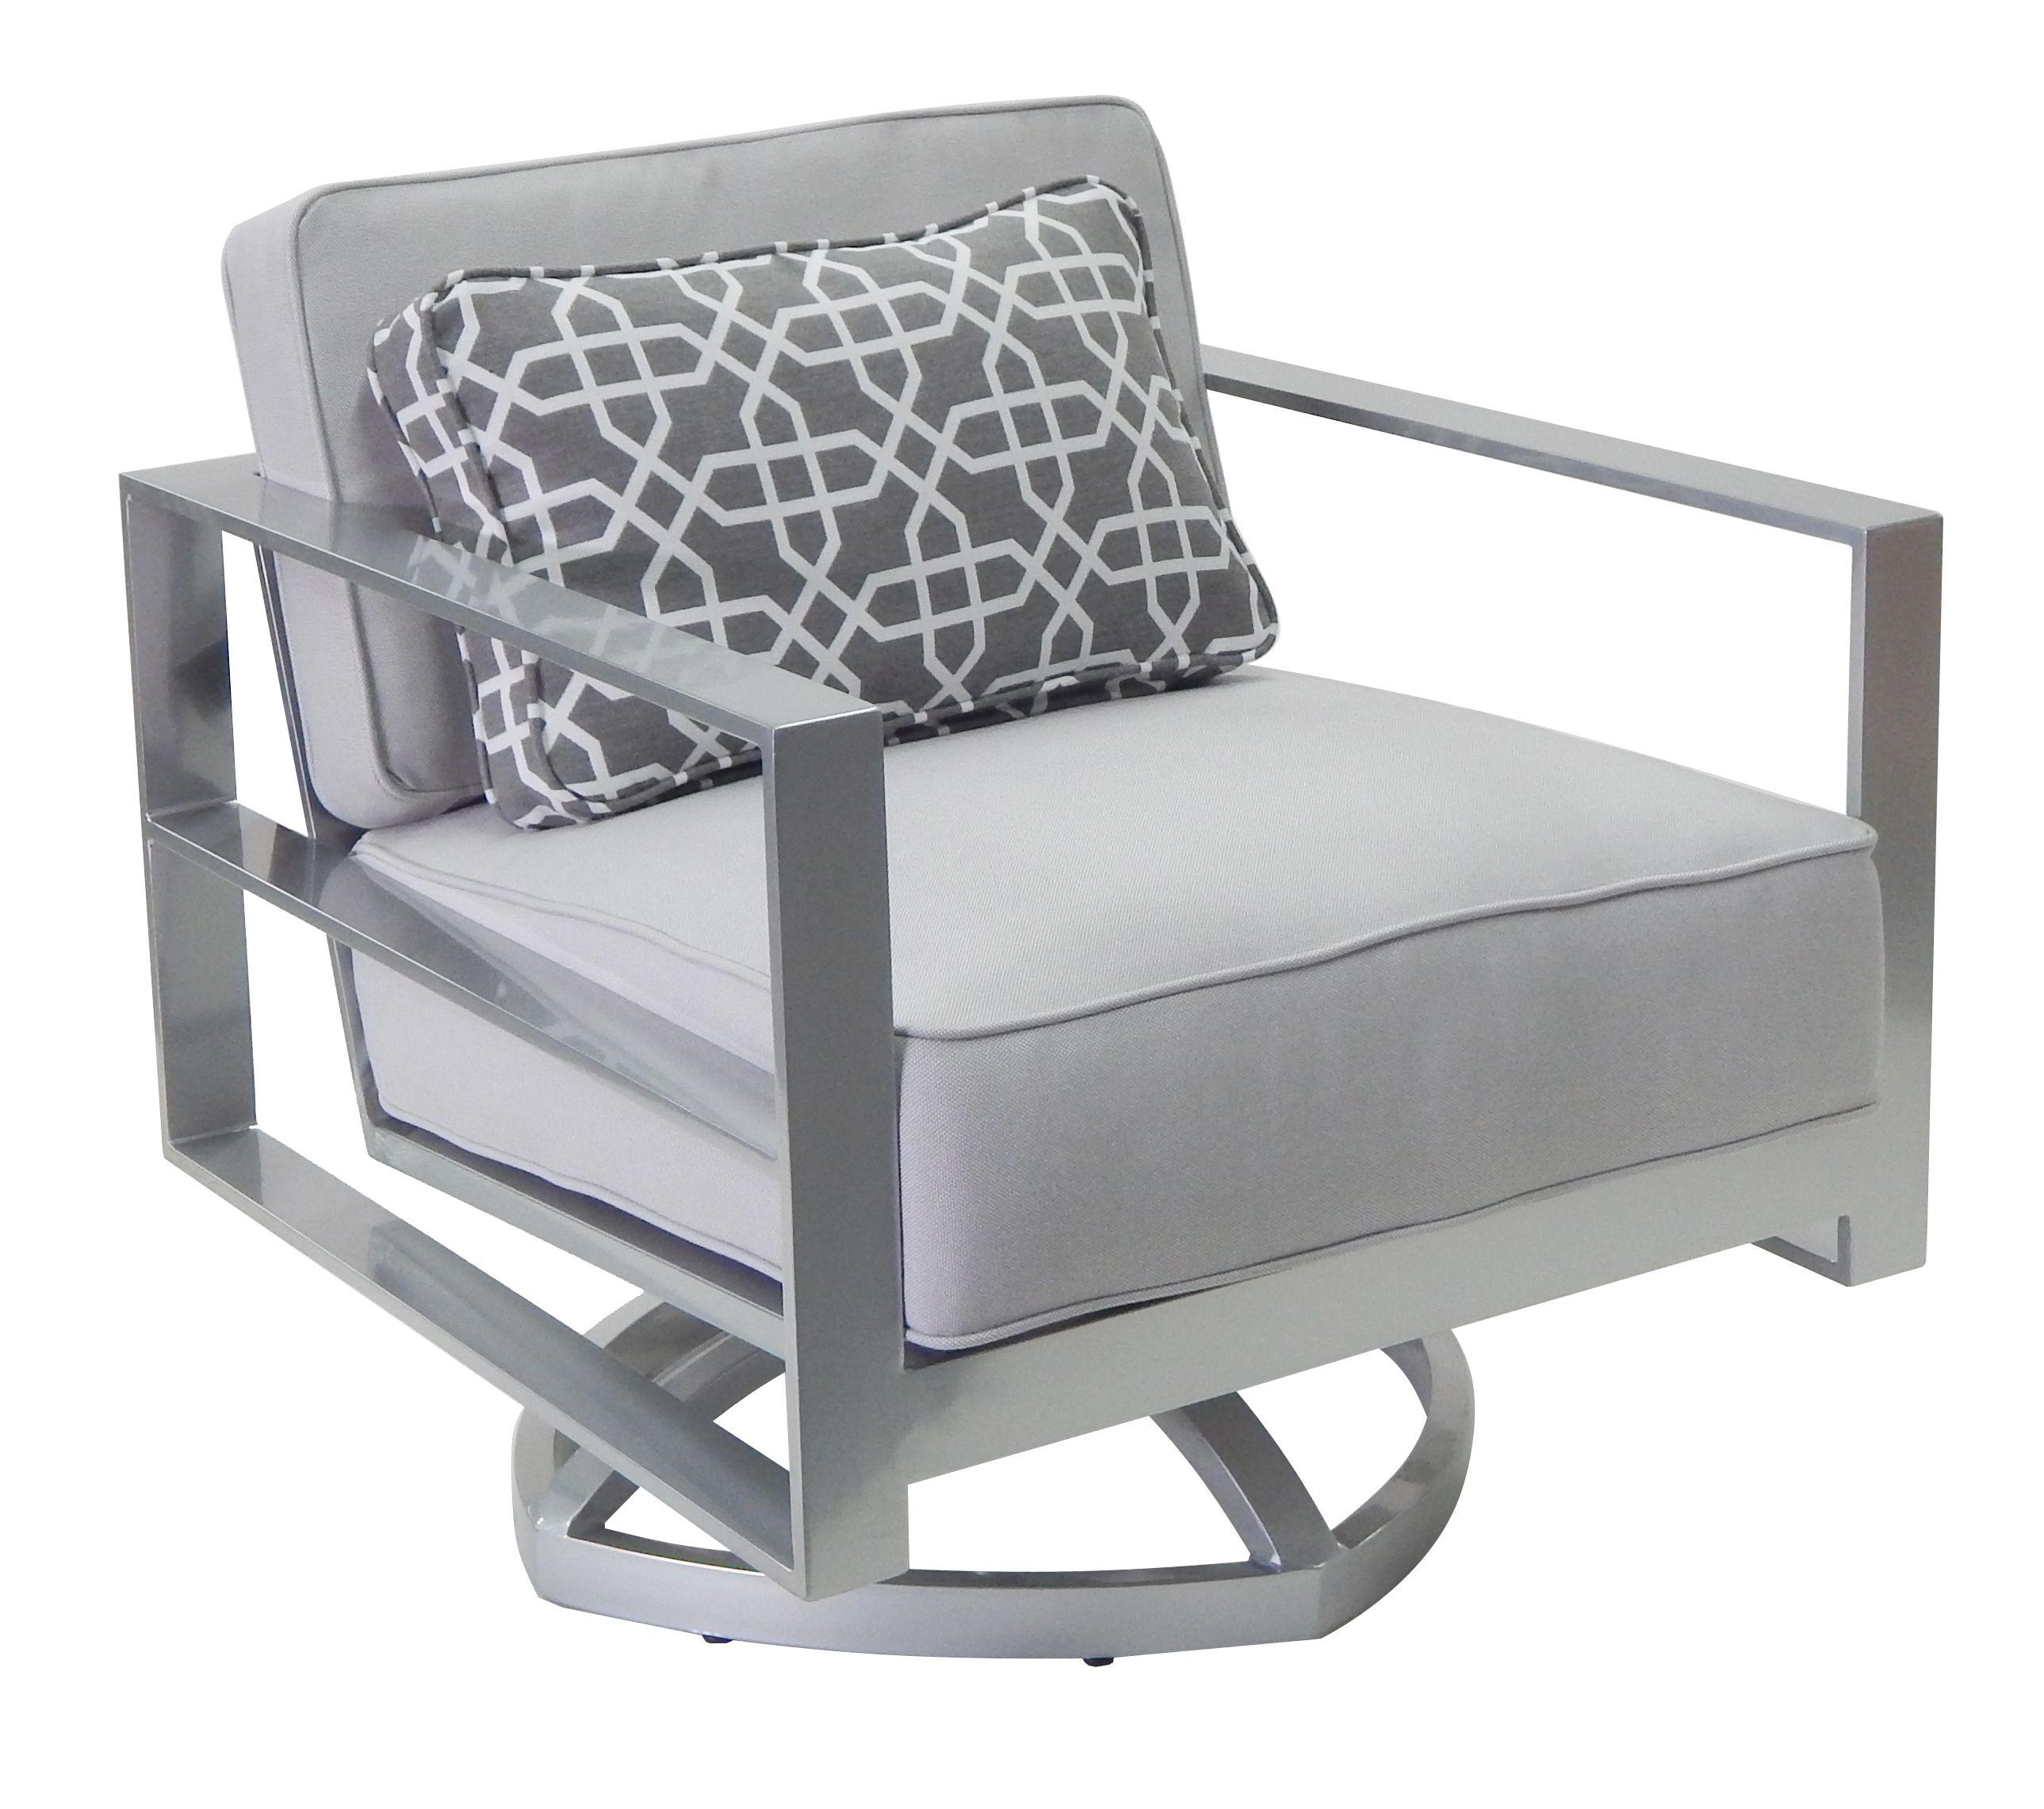 Sunnyland Patio Furniture Horizons Cushion Club Swivel